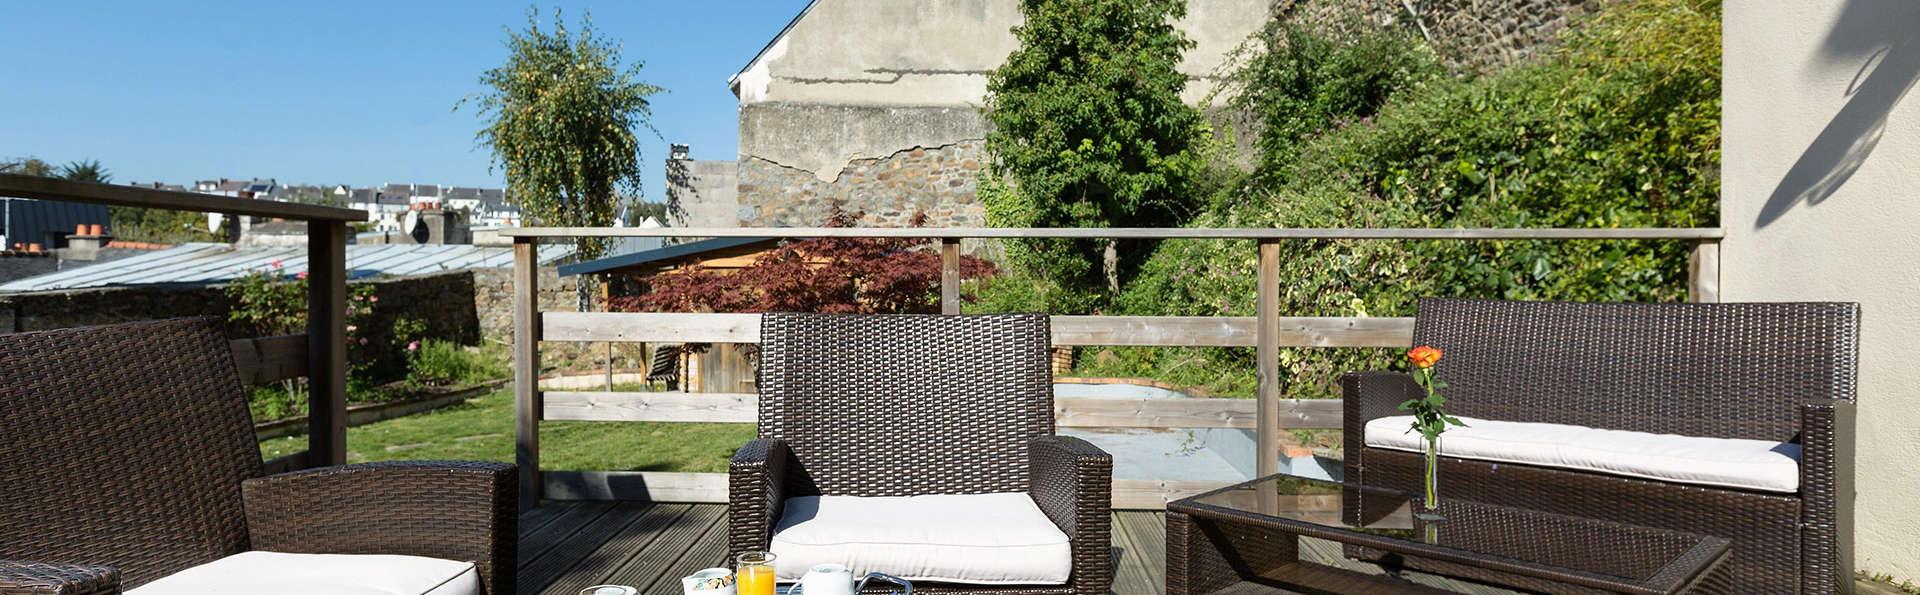 h tel de clisson saint brieuc hotel saint brieuc. Black Bedroom Furniture Sets. Home Design Ideas